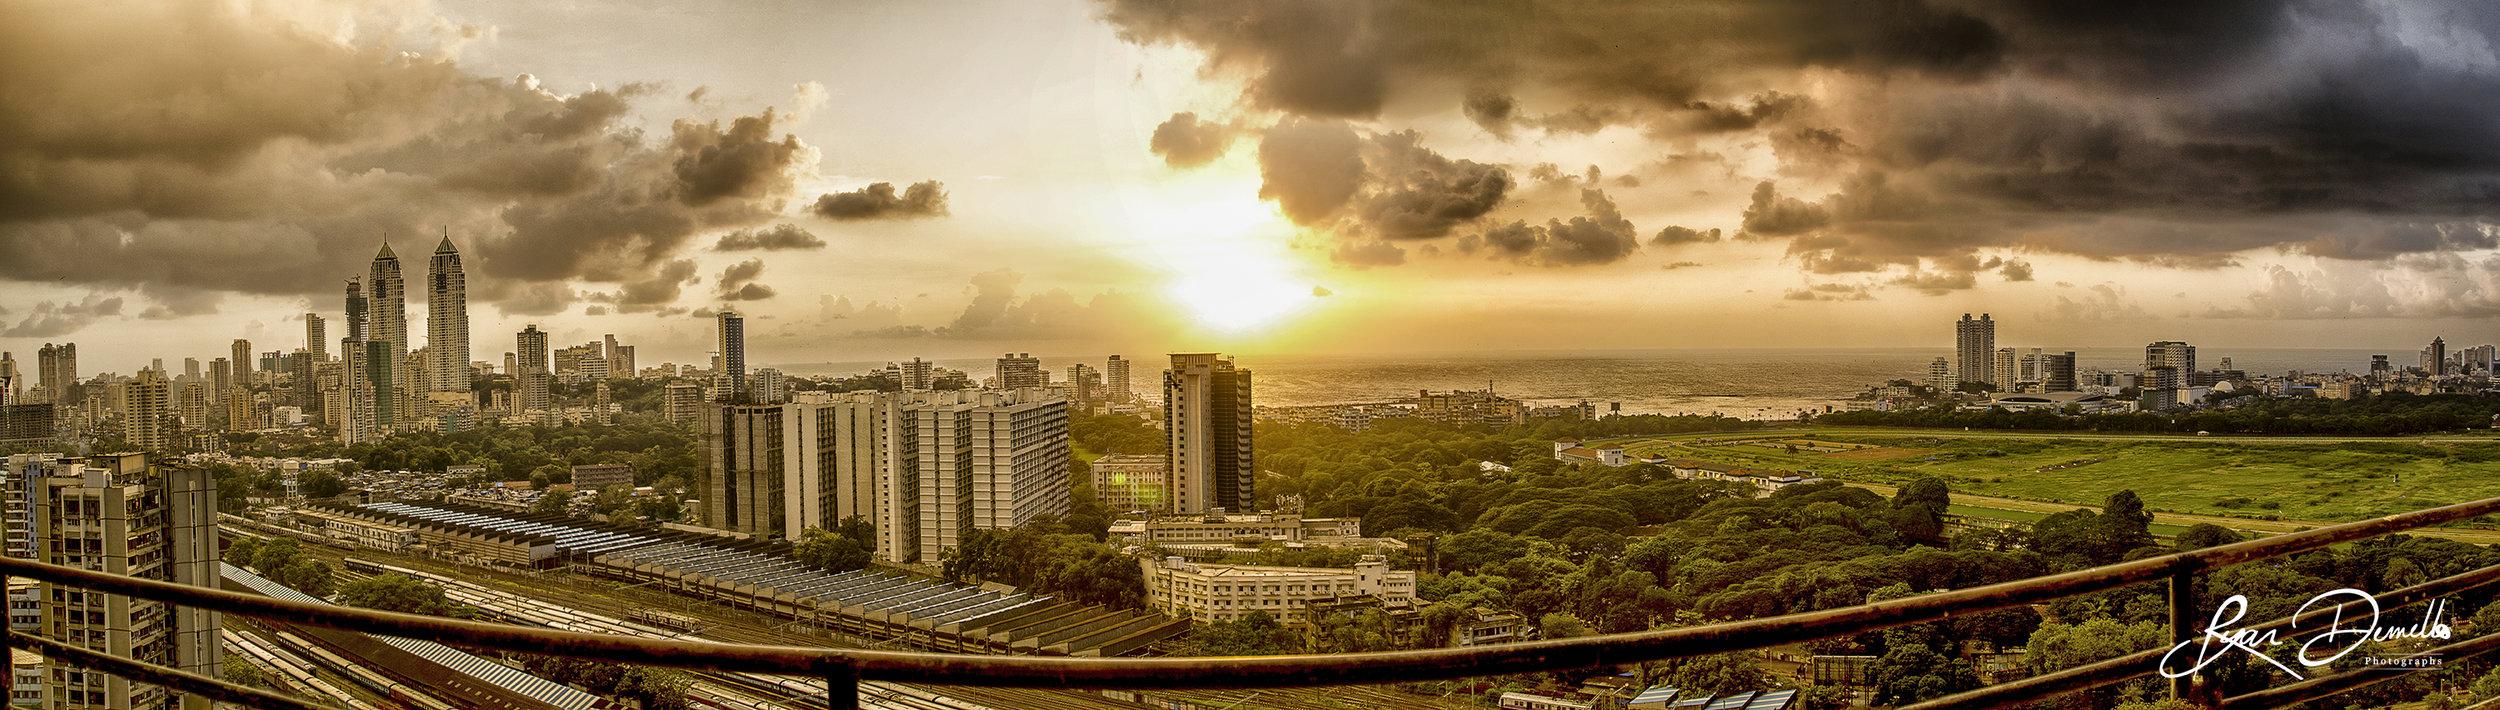 The View From the 38th floor at Mahalaxmi